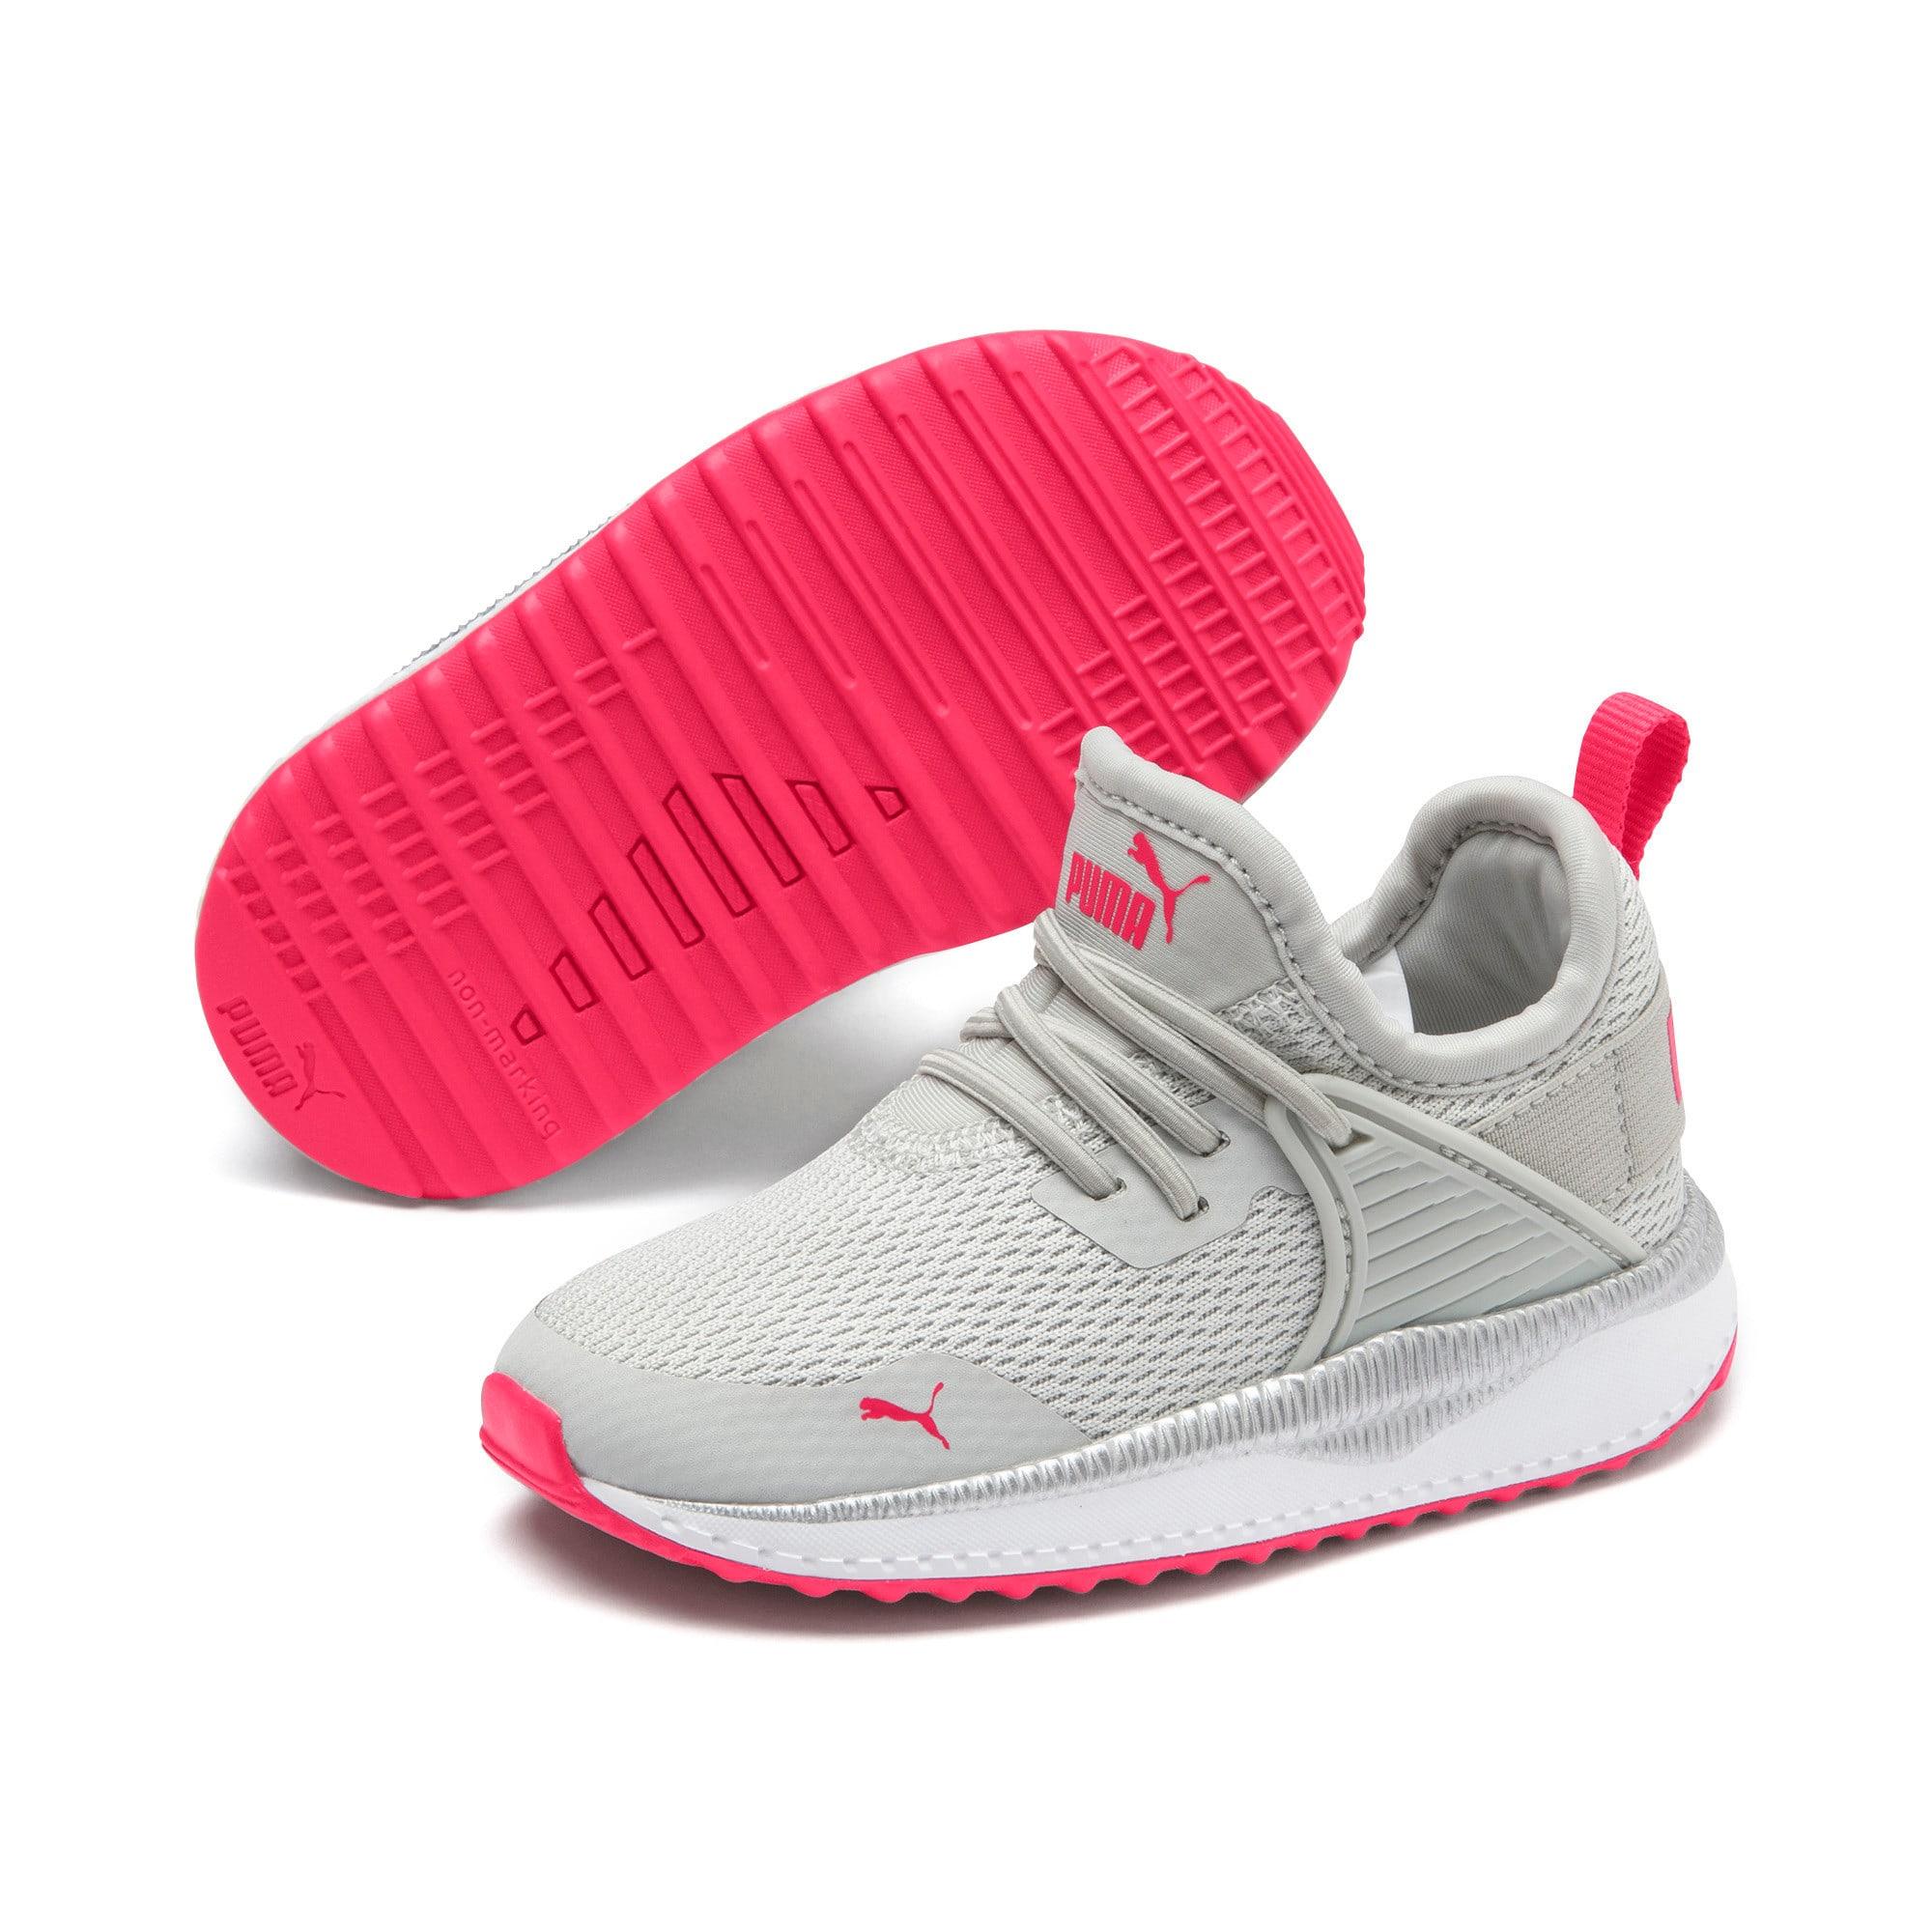 Thumbnail 2 of Pacer Next Cage Metallic Toddler Shoes, Gray Violet-Nrgy Rose, medium